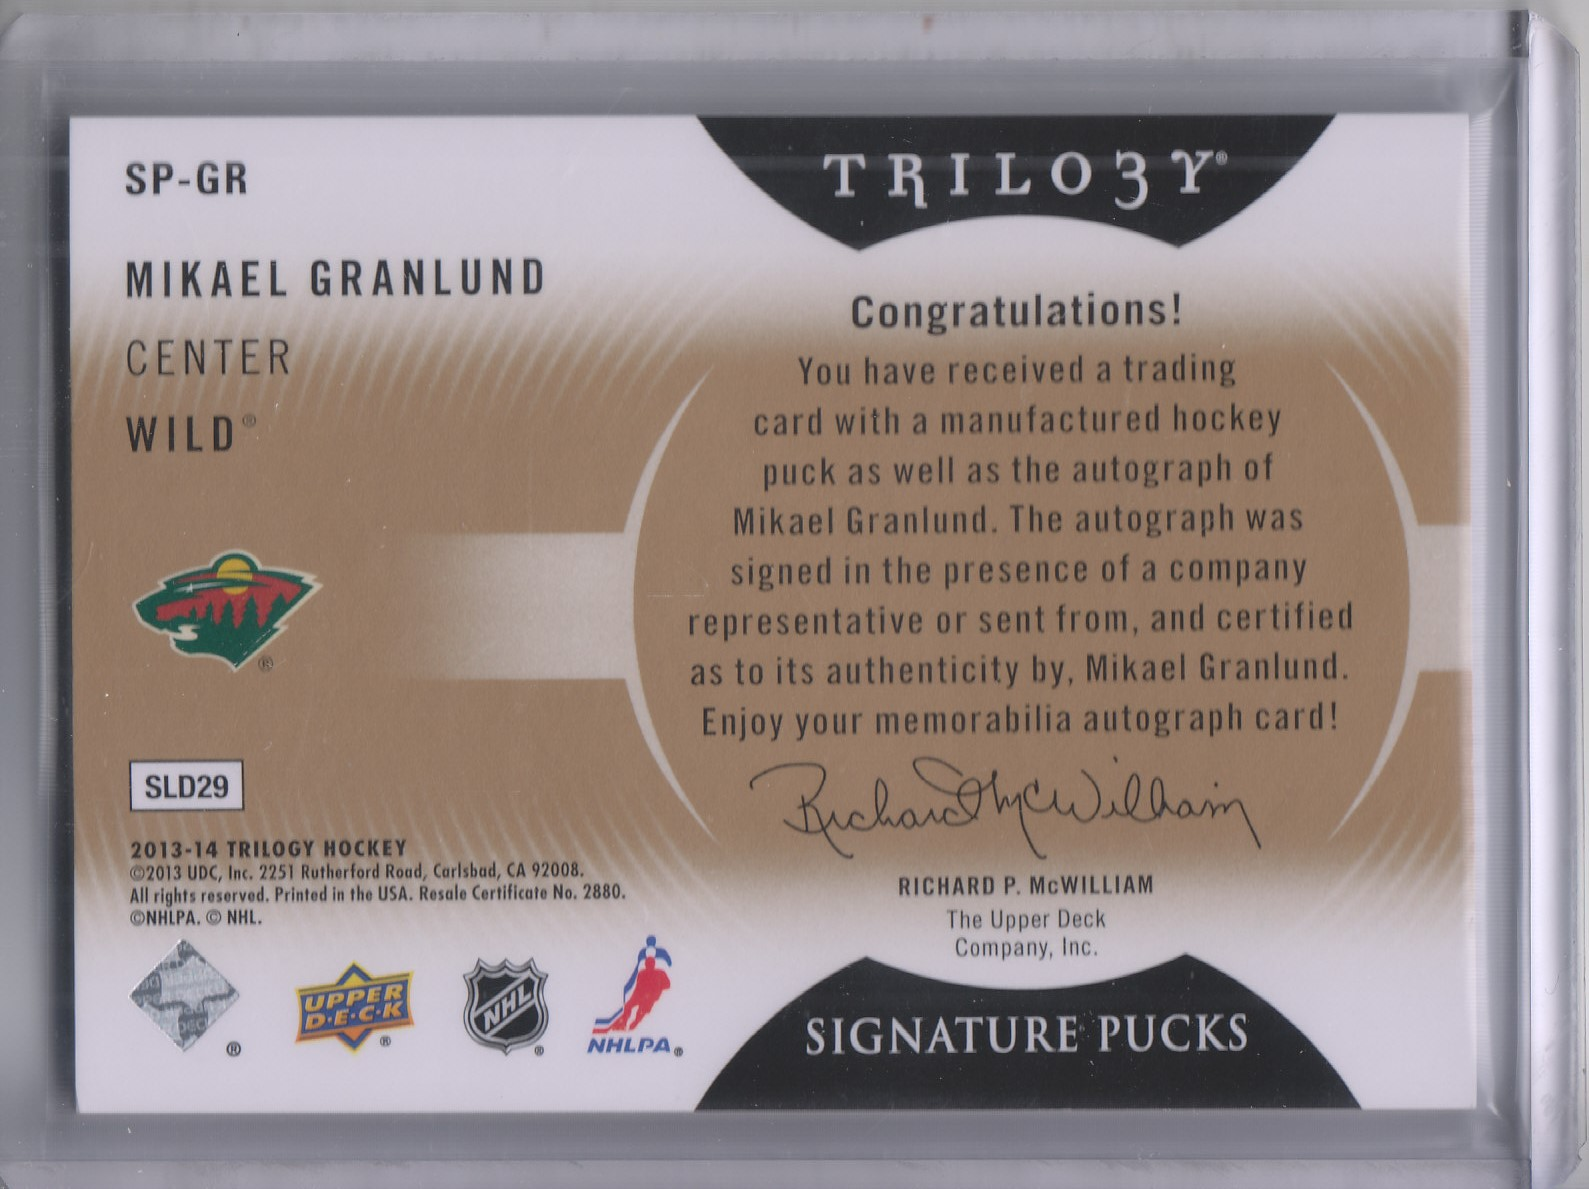 2013-14 Upper Deck Trilogy Signature Pucks #SPGR Mikael Granlund E back image